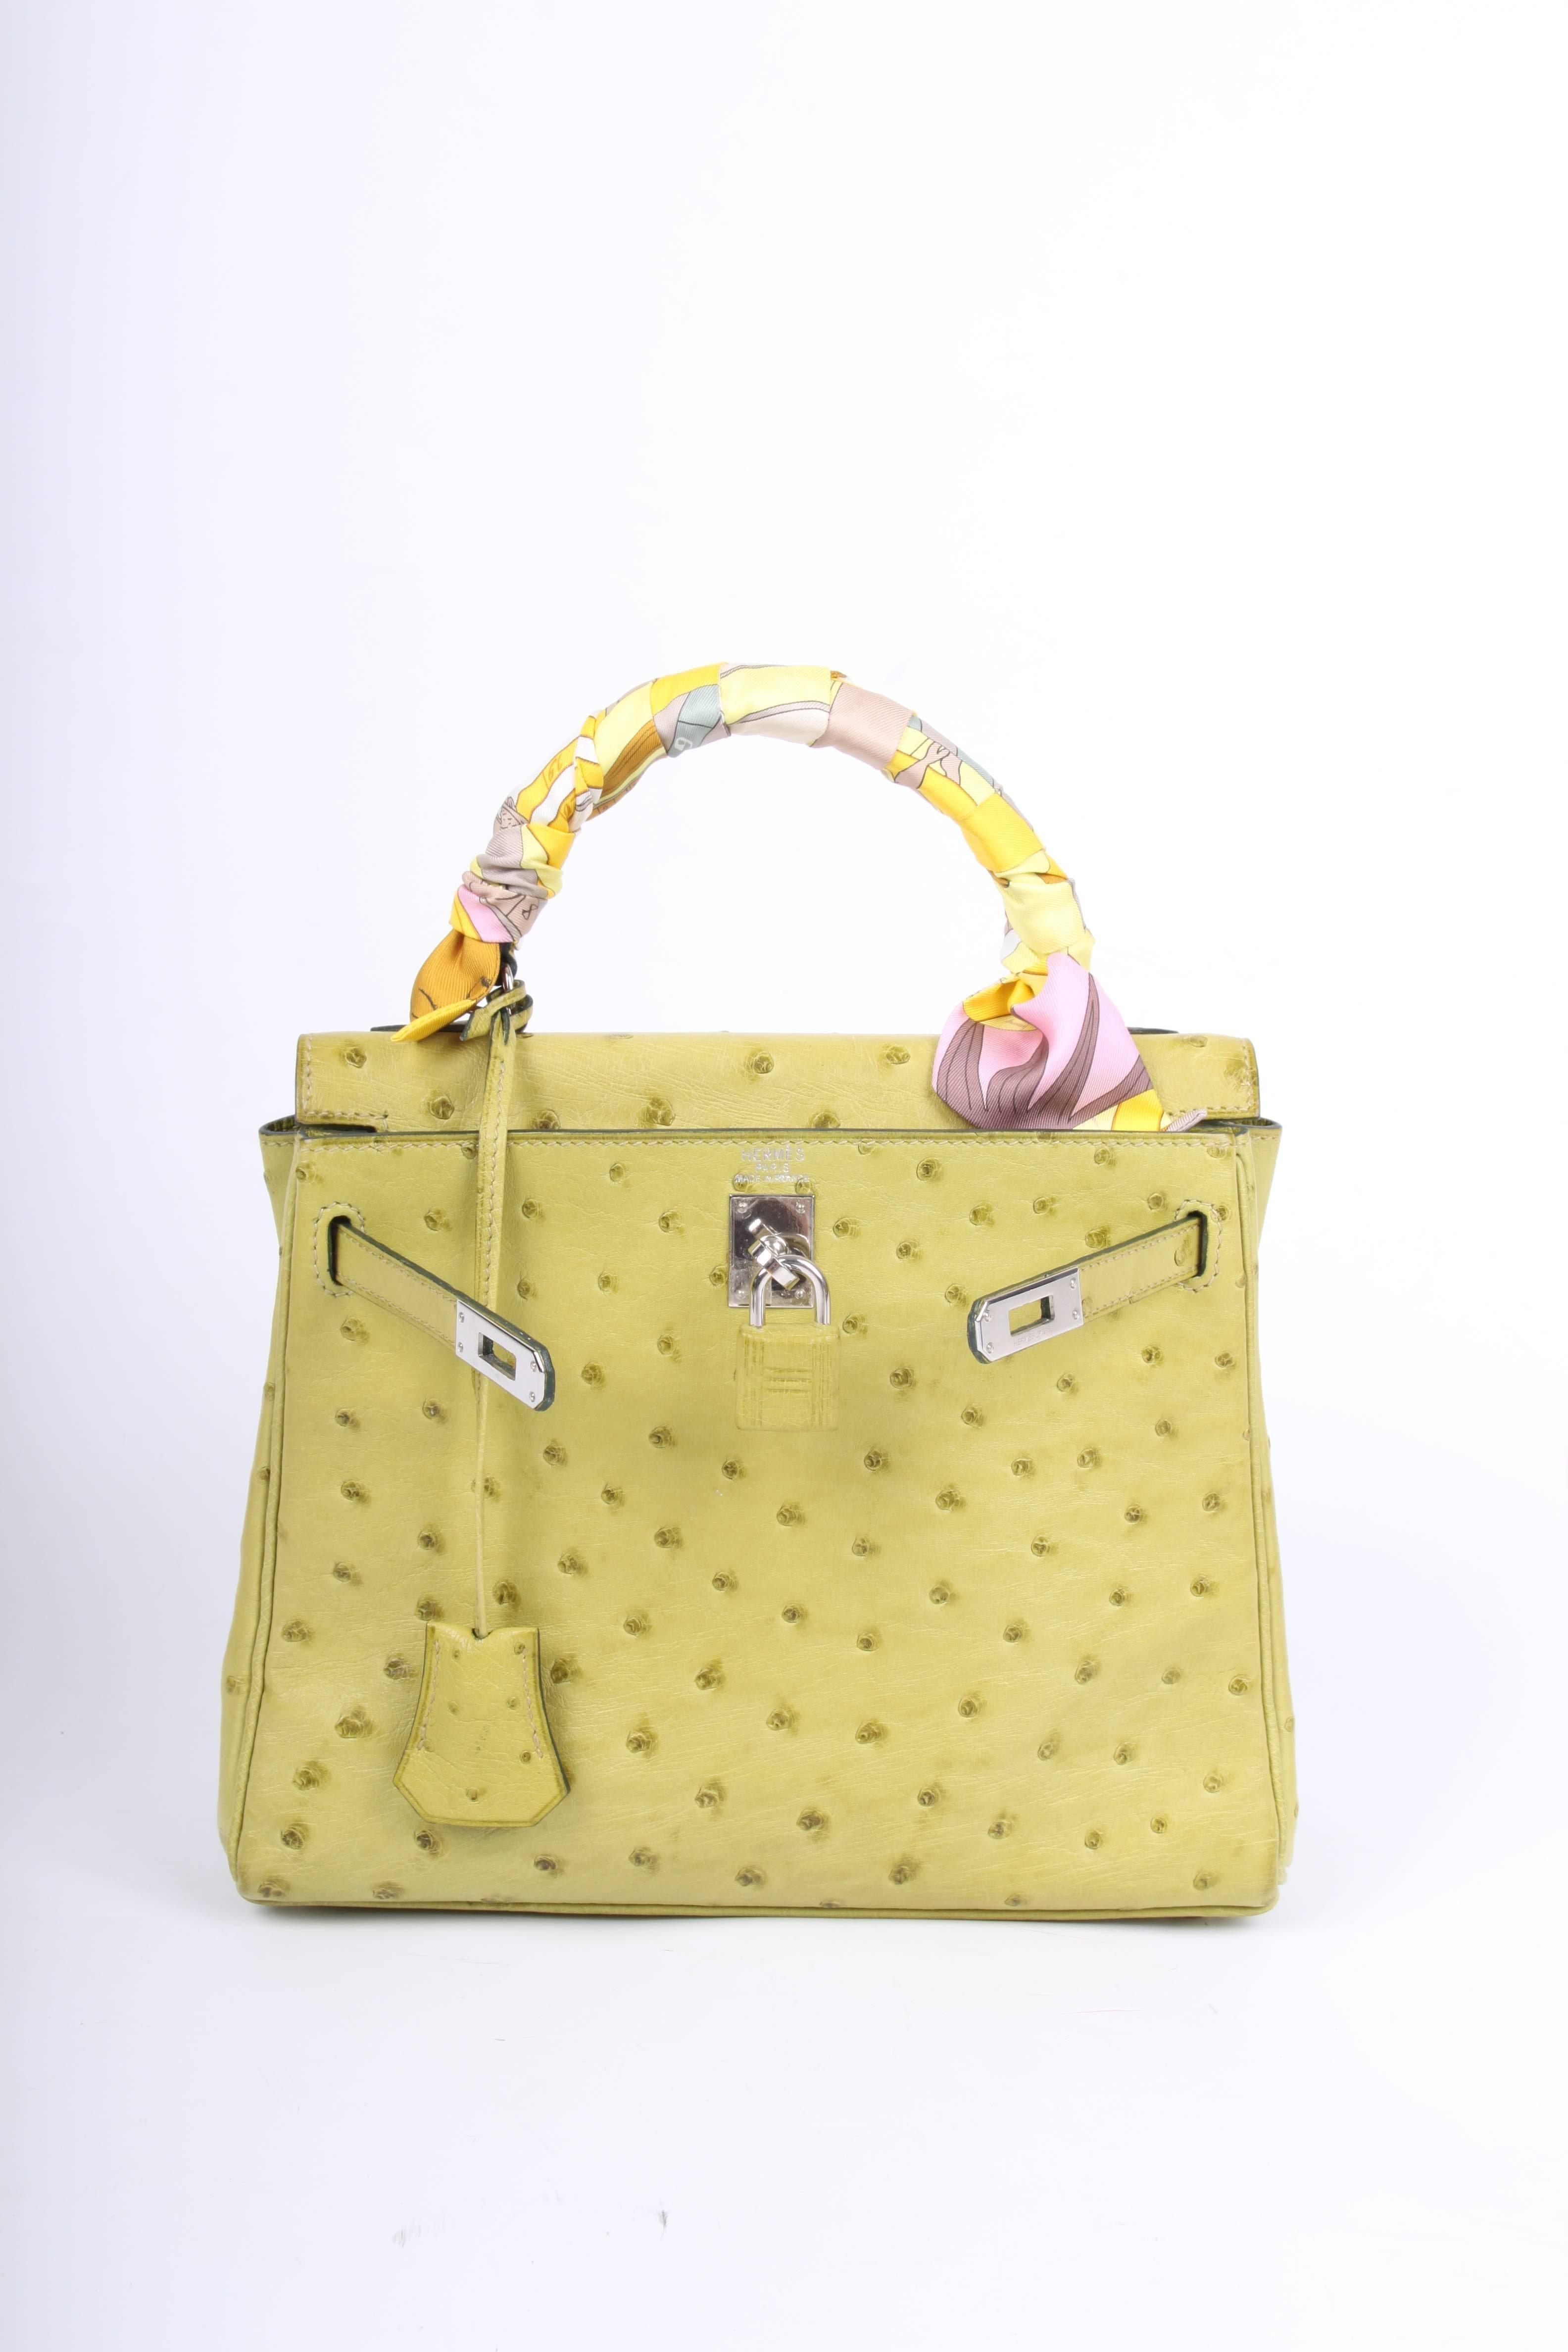 Hermes lime green 25 Ostrich Leather Kelly Bag at 1stdibs bdf3bdc618c4e